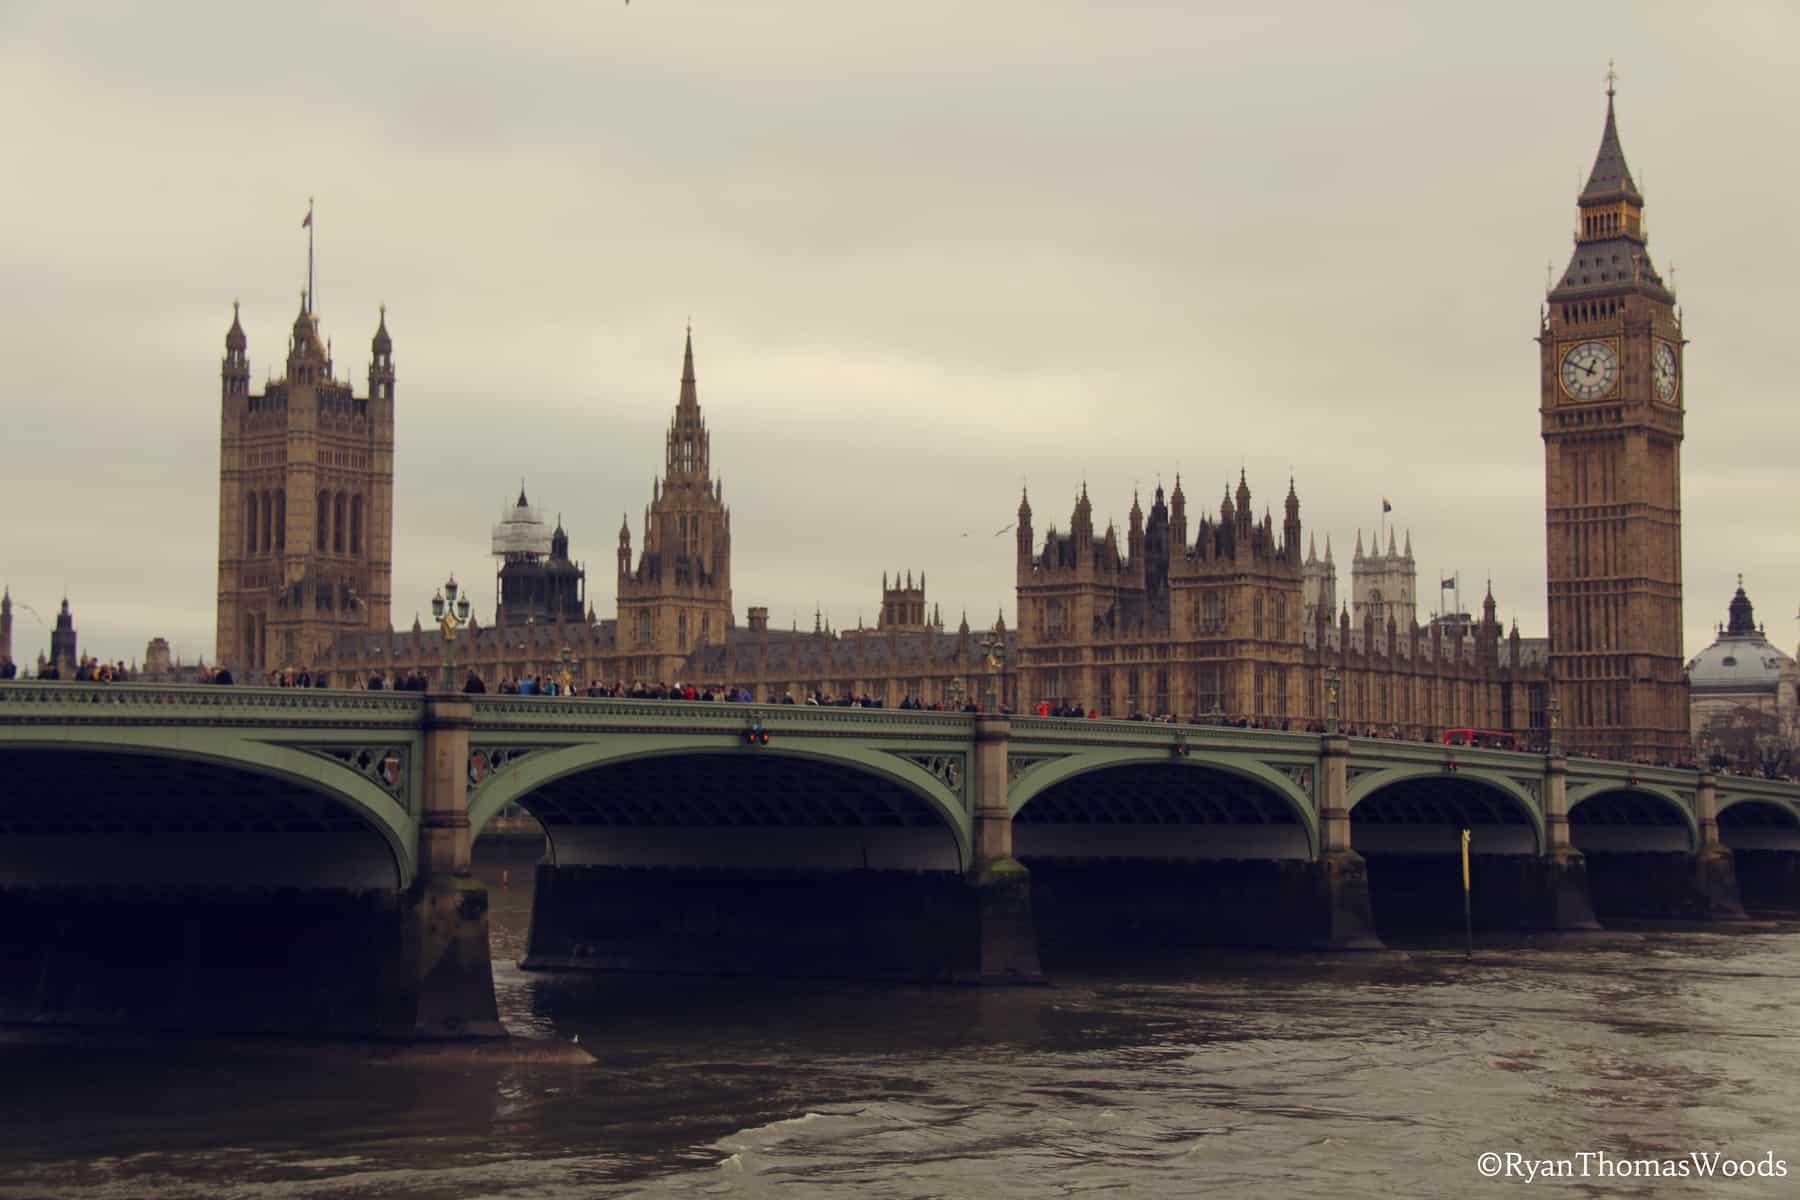 Parliament Buildings & Big Ben, London, England